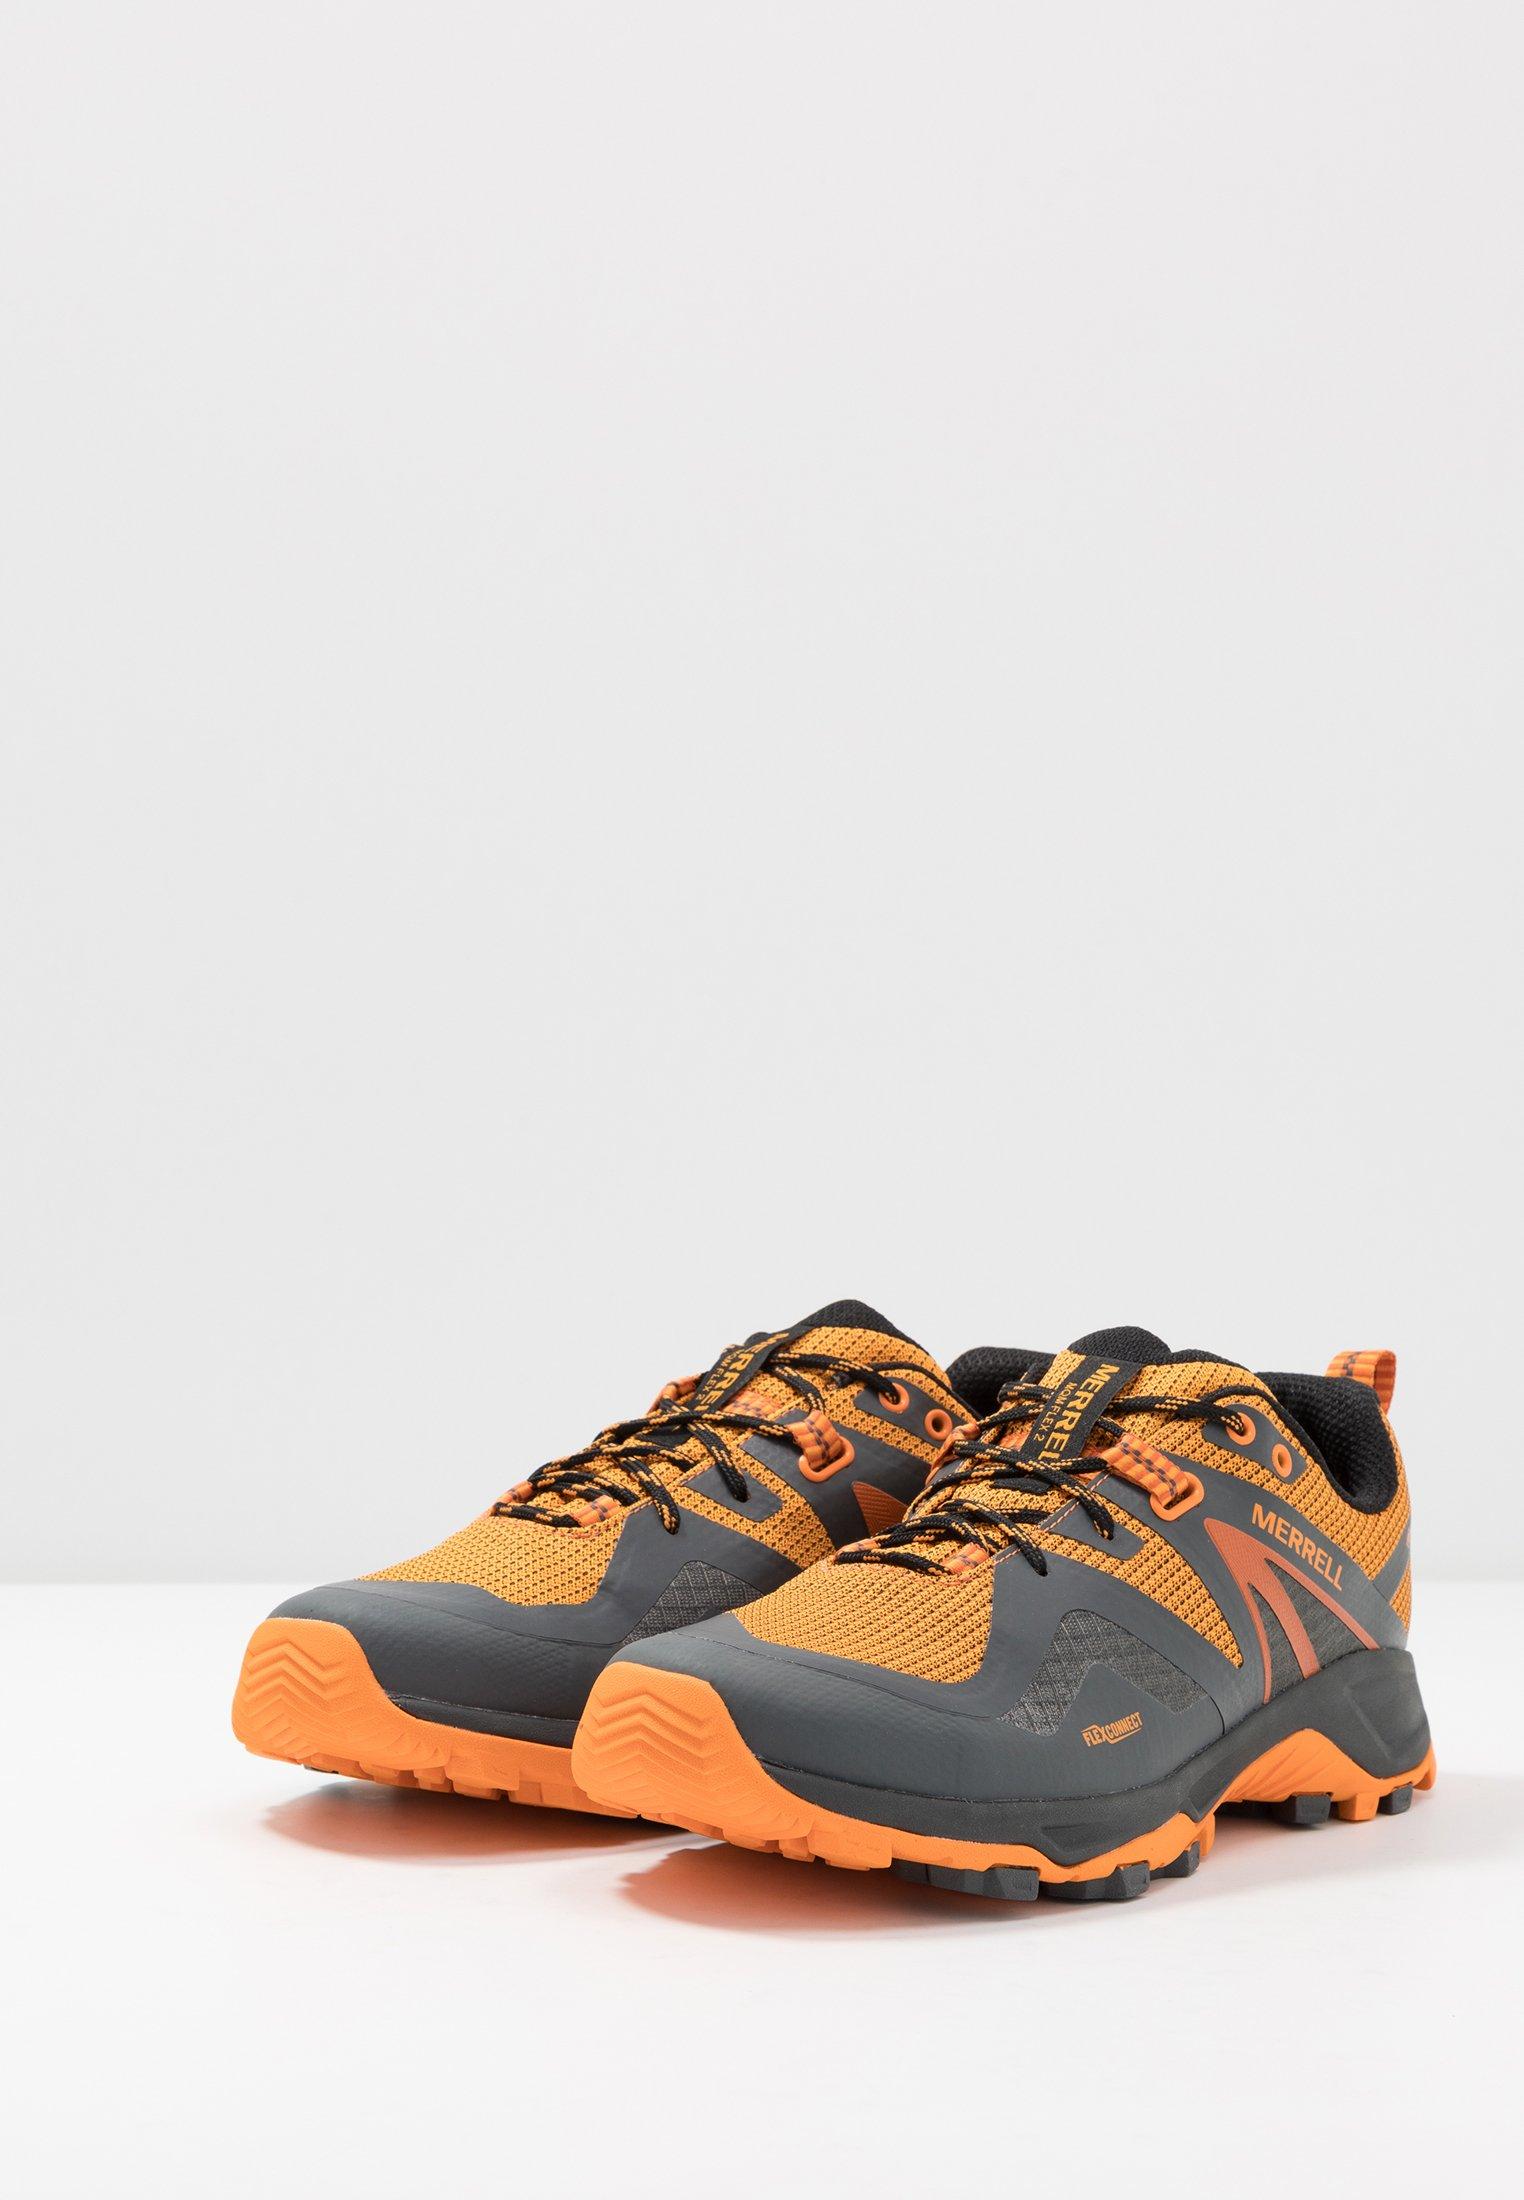 Merrell MQM FLEX 2 GTX - Hikingschuh - orange - Herrenschuhe XmTJm